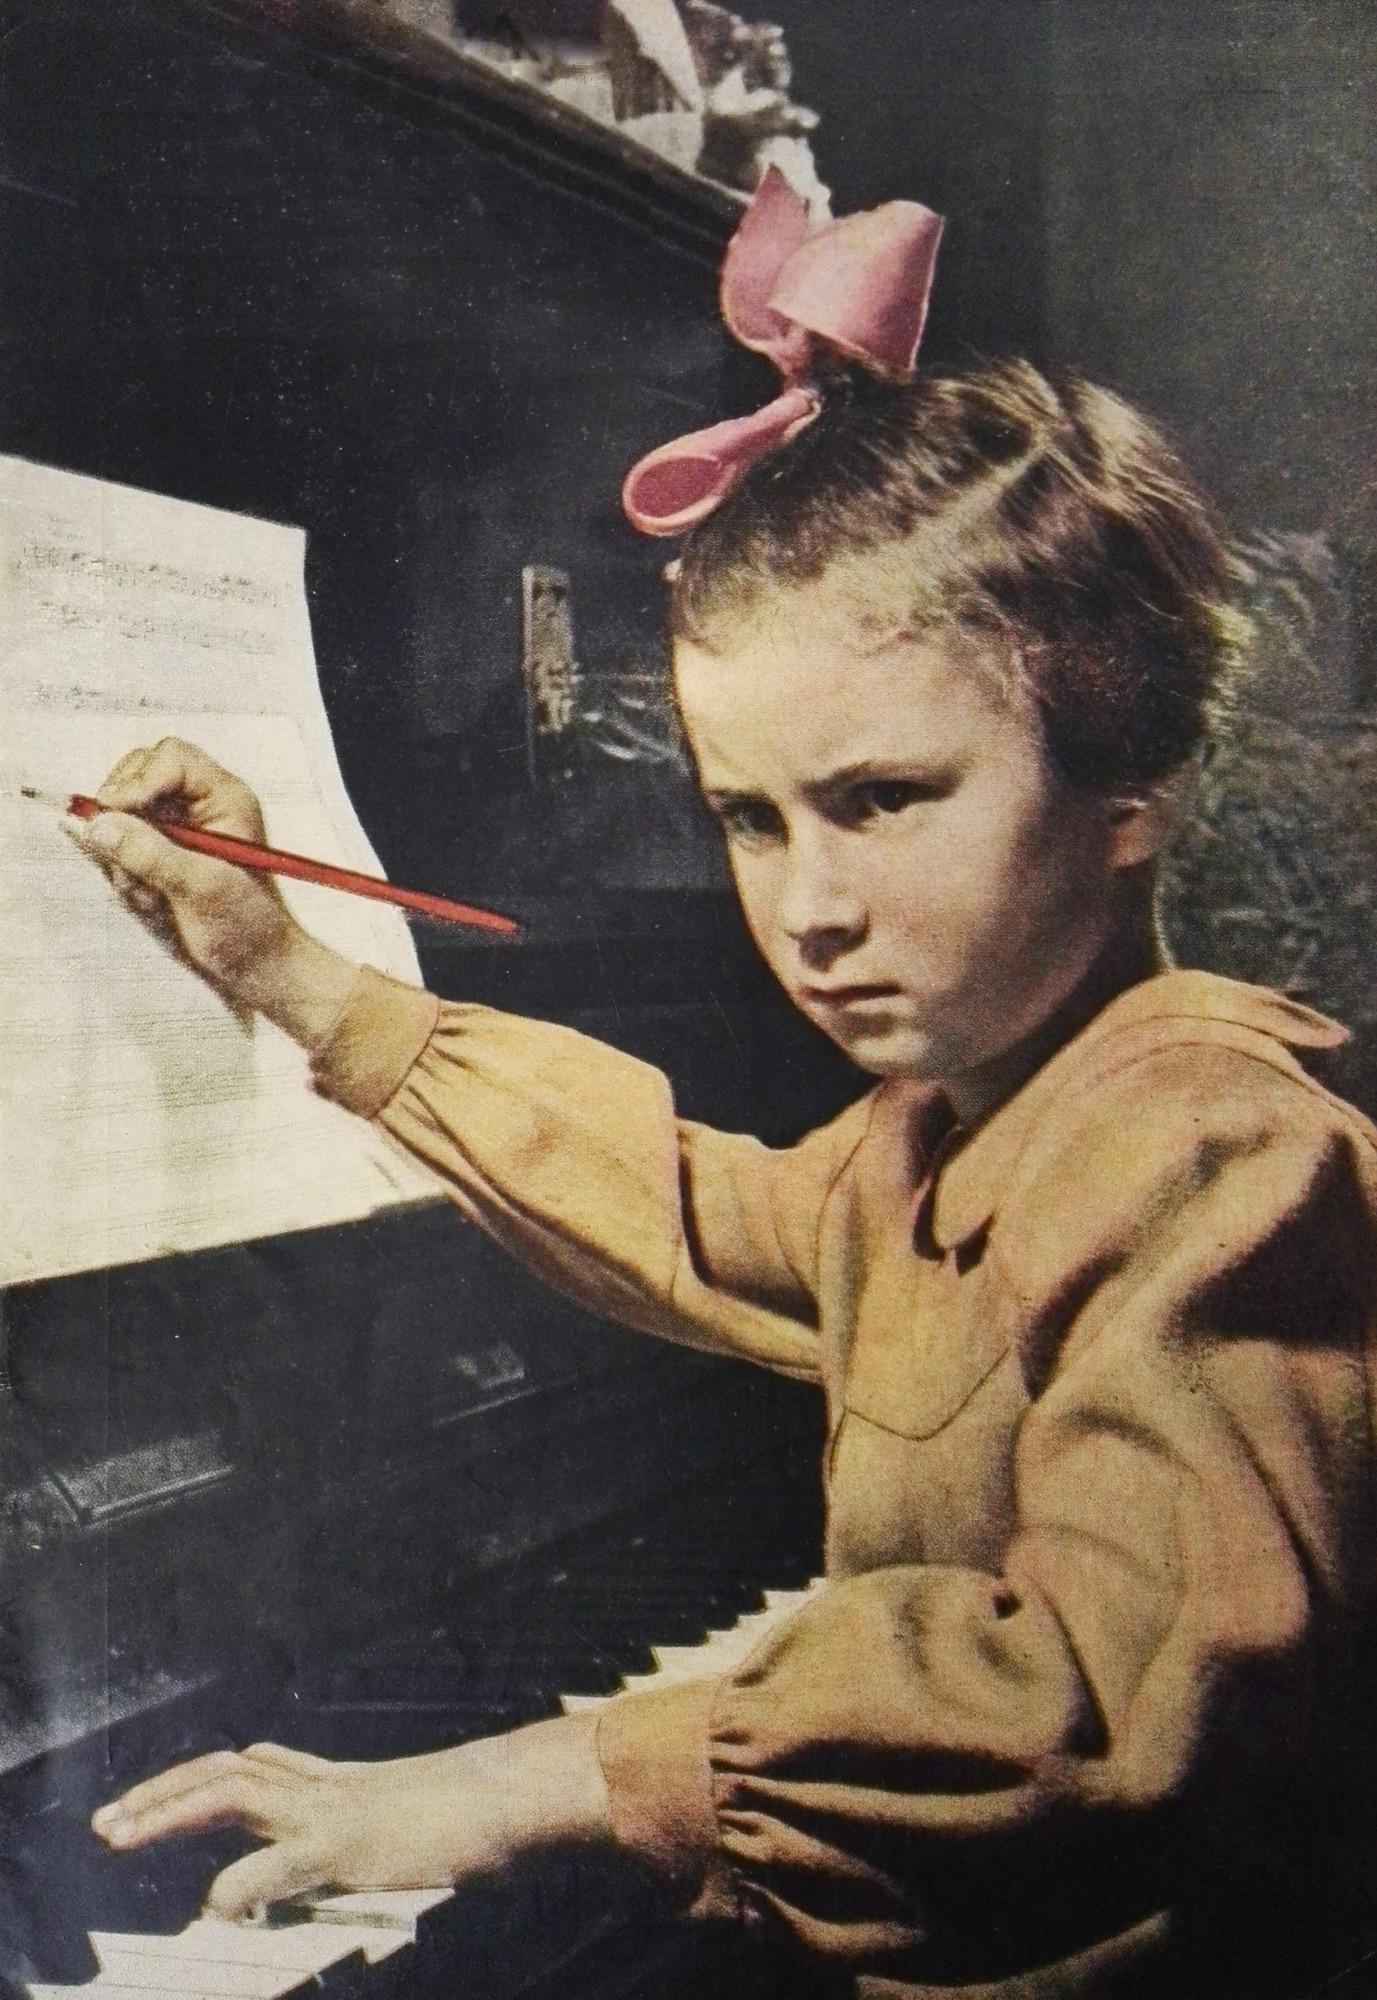 Юный композитор Таня Тарасенко, 1951 / Фото из семейного архива Вадима Рогалина